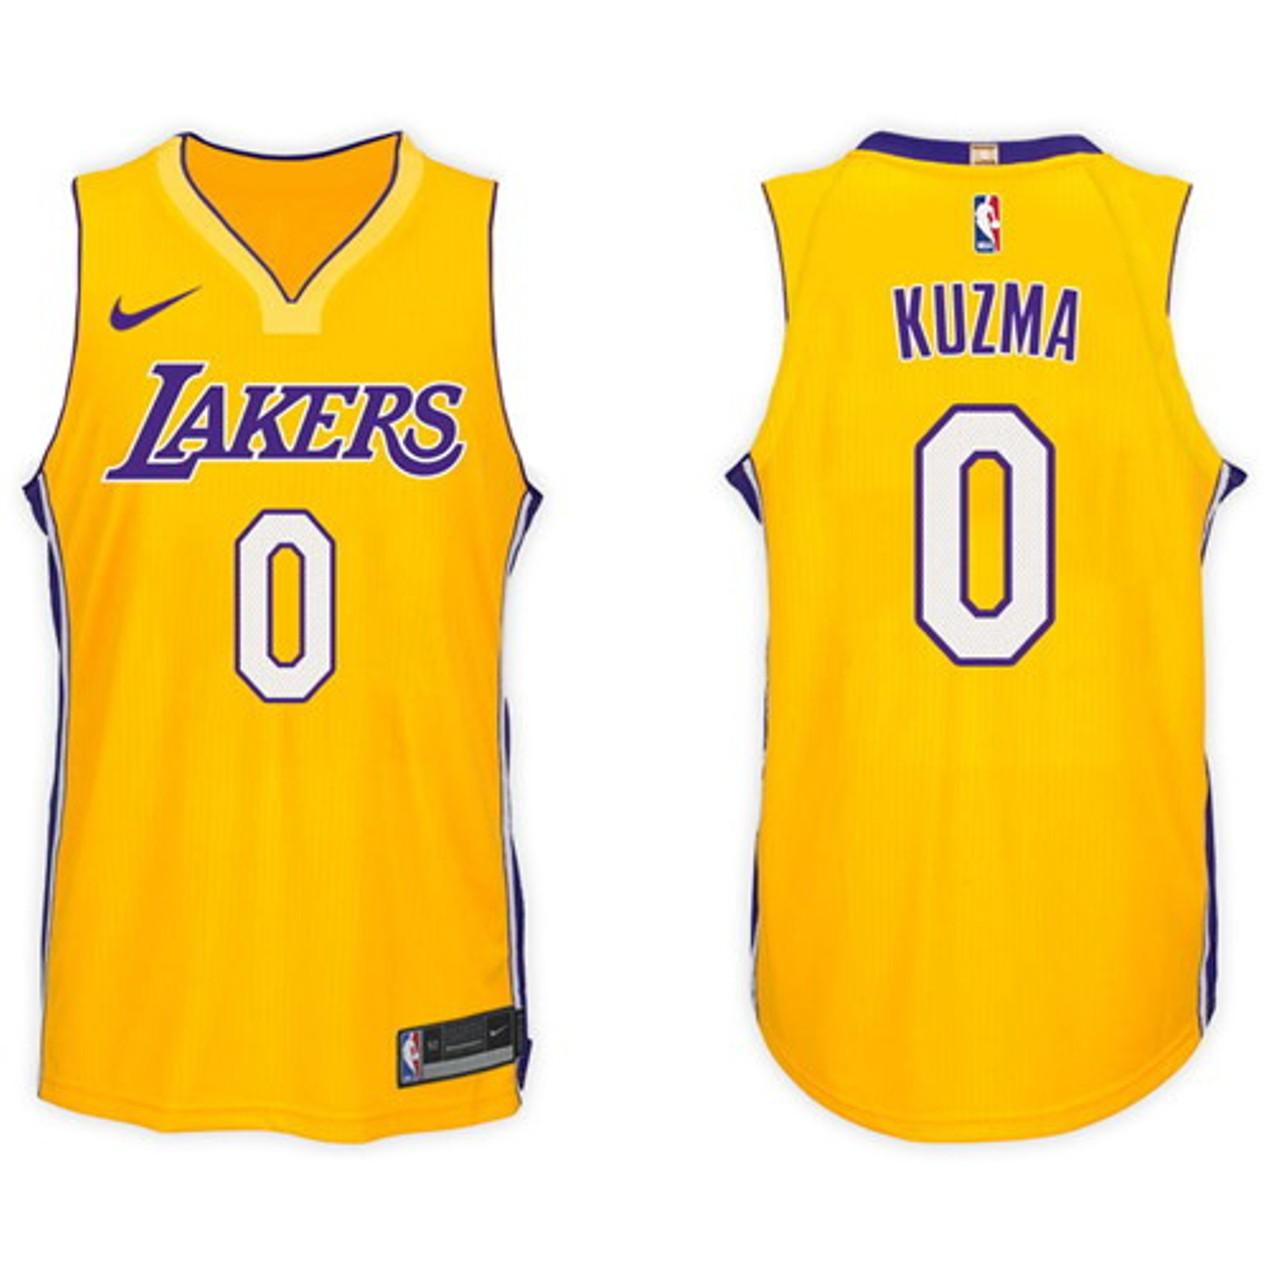 more photos 24a17 e5482 2017-18 wish Los Angeles Lakers #0 Kyle Kuzma Basketball ...